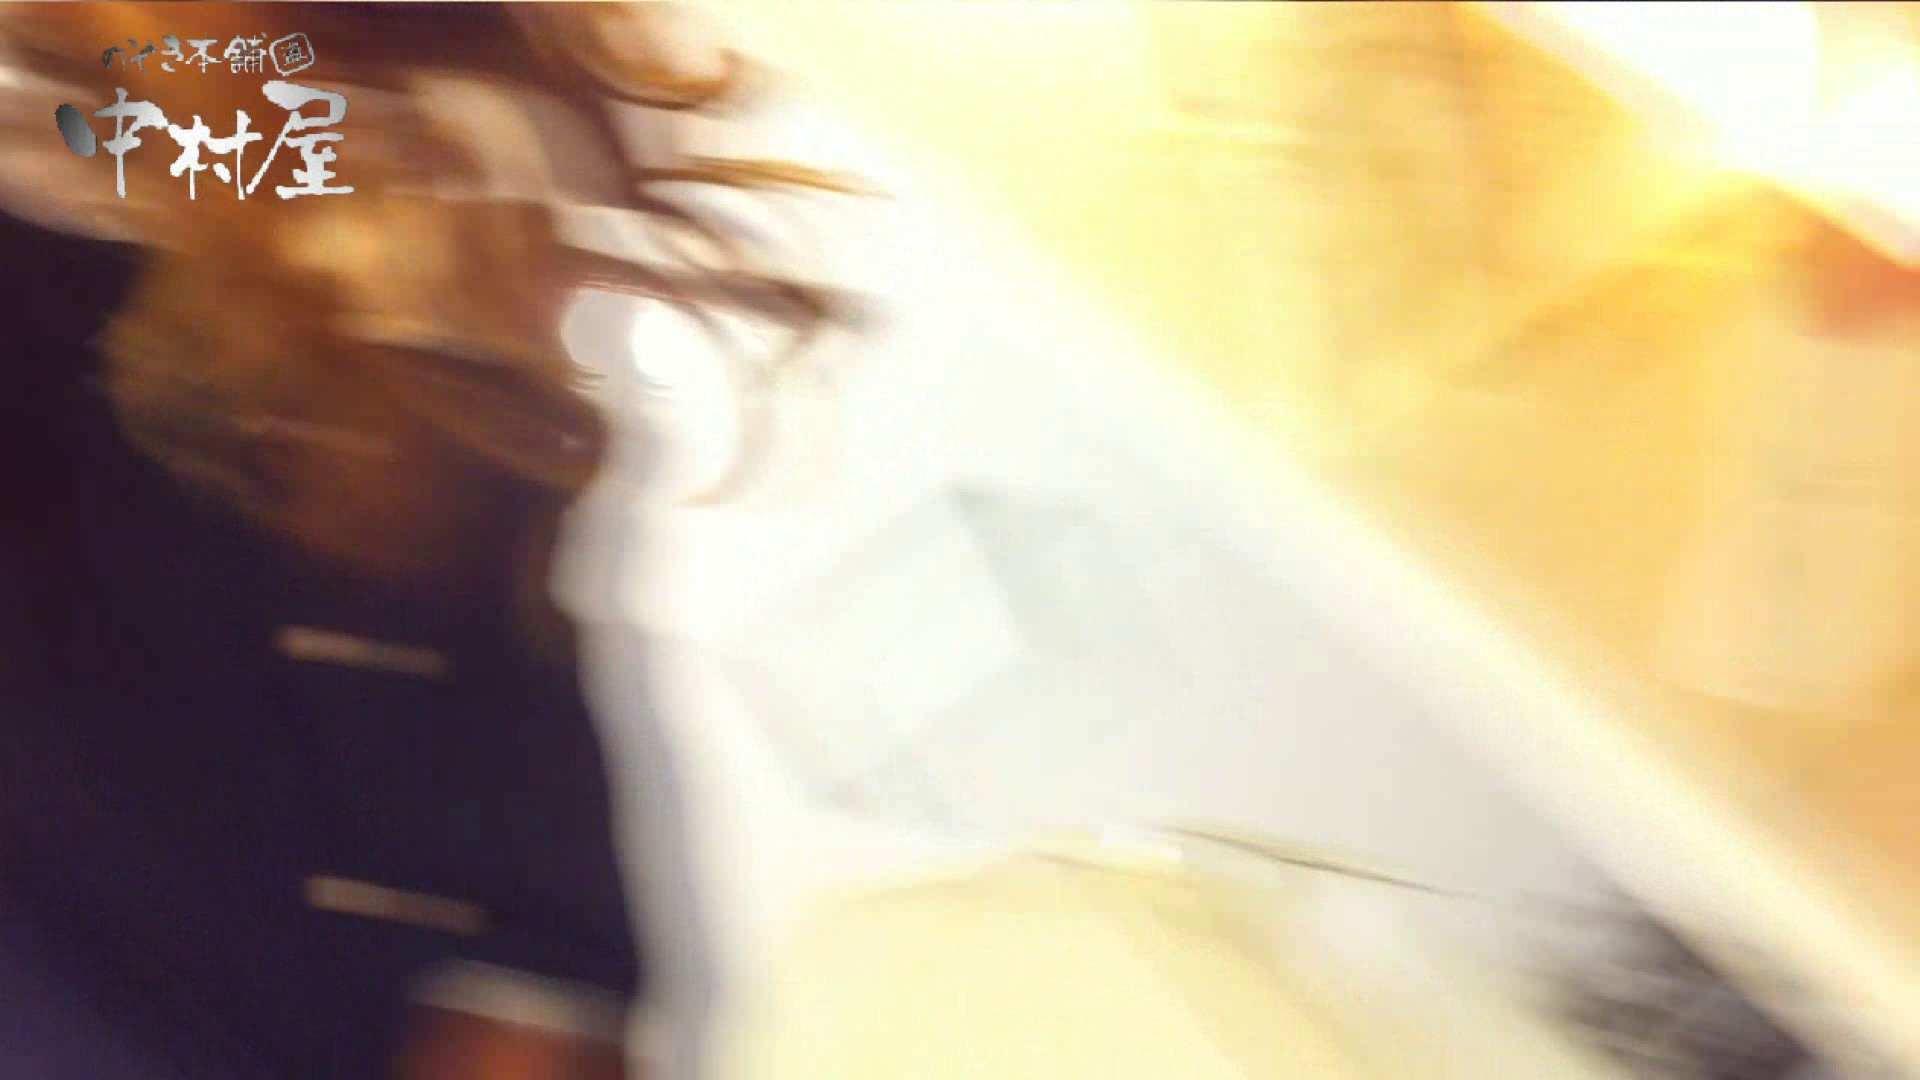 vol.66 美人アパレル胸チラ&パンチラ 店員さんのパンツはストライプ 胸チラ 隠し撮りセックス画像 87PICs 44